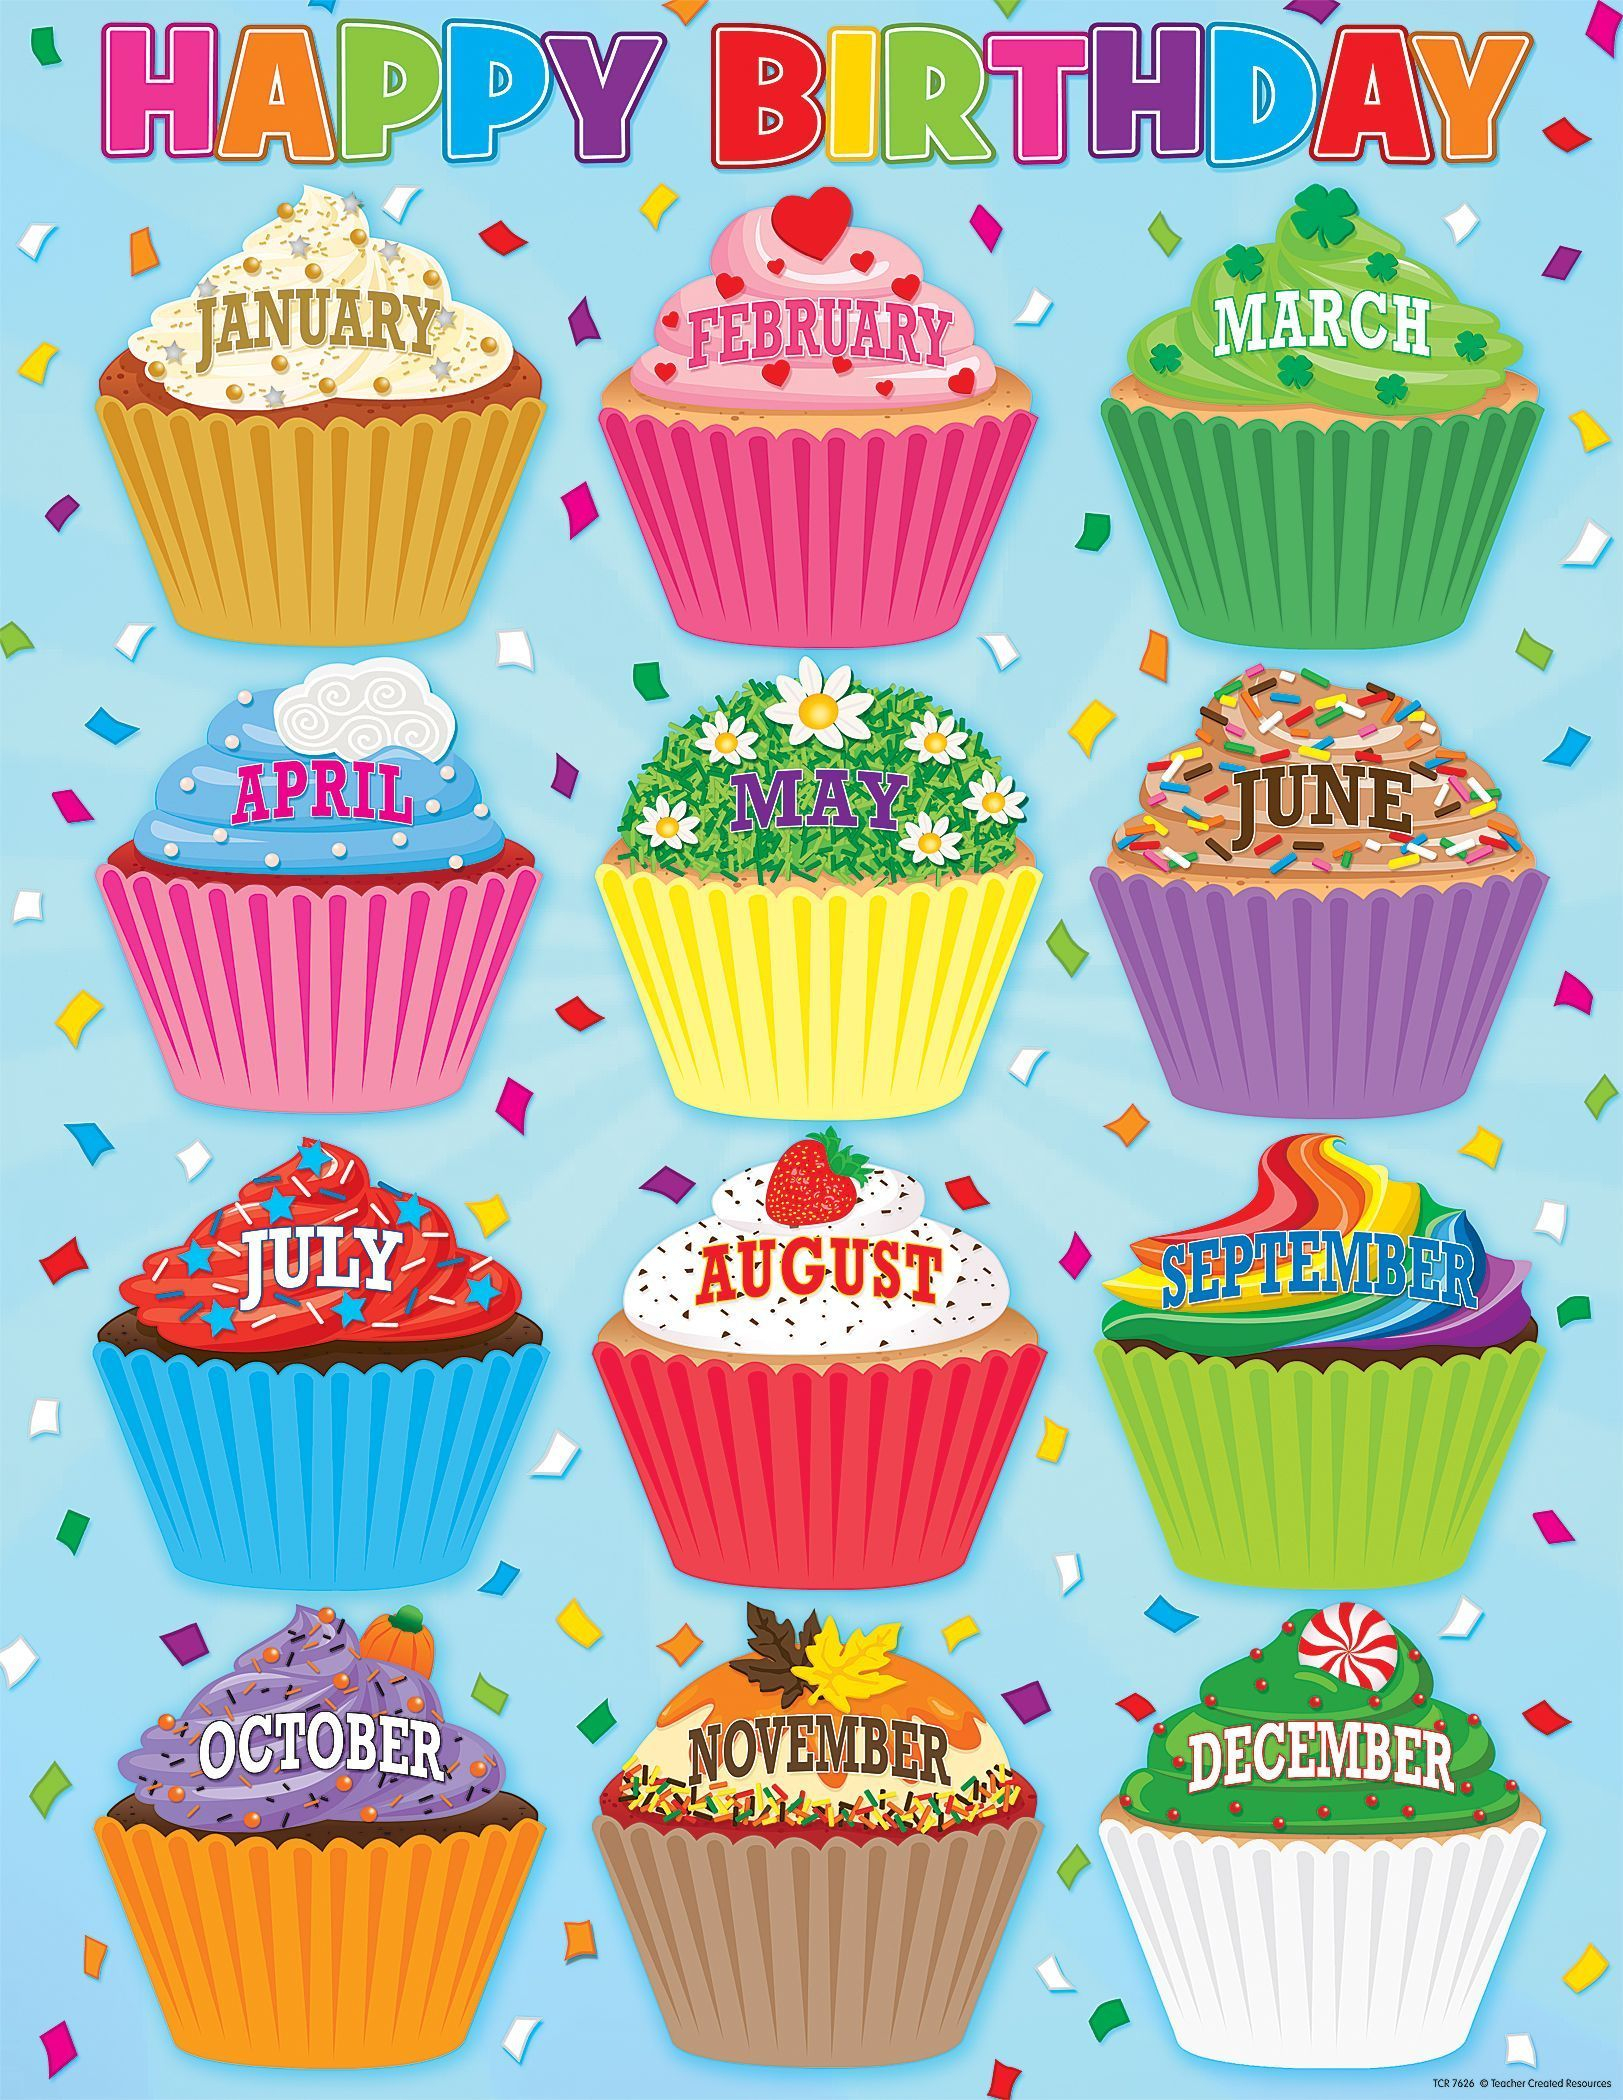 Cupcakes Happy Birthday Chart | Birthday Charts, Classroom throughout Cupcake Birthday Chart